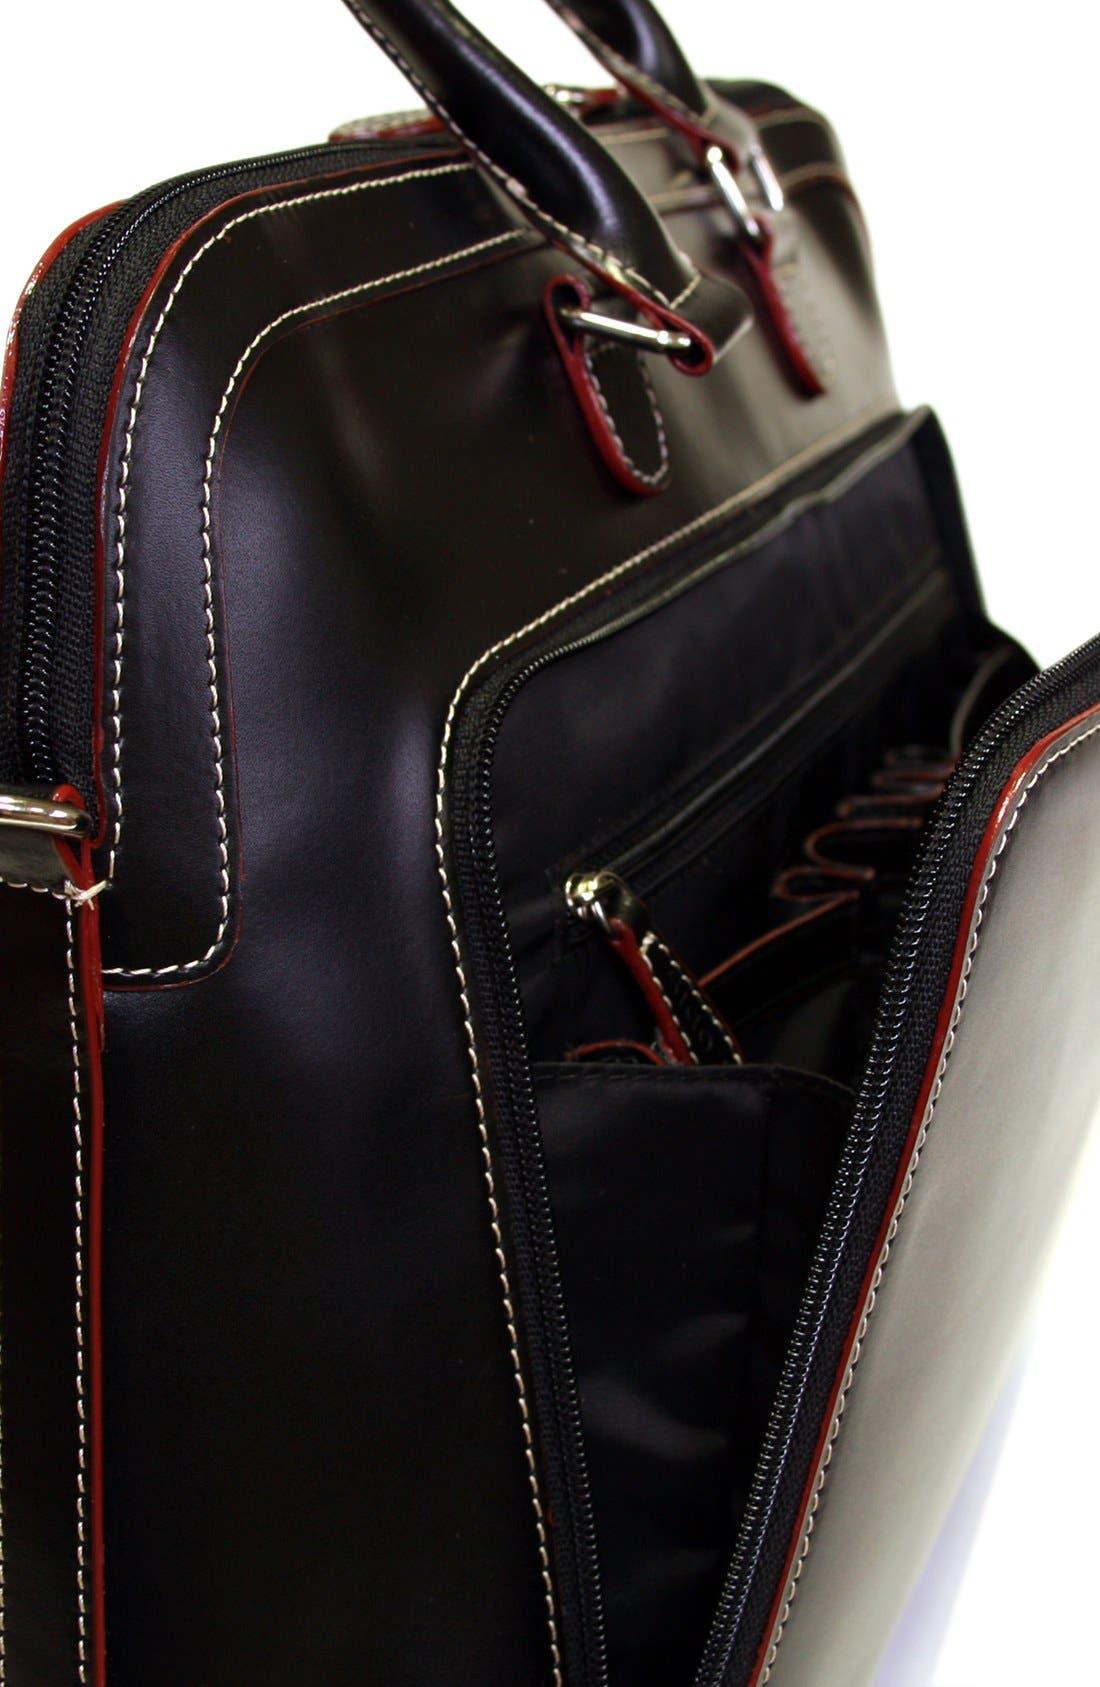 Lodis 'Audrey Brera' Leather Briefcase,                             Alternate thumbnail 8, color,                             001